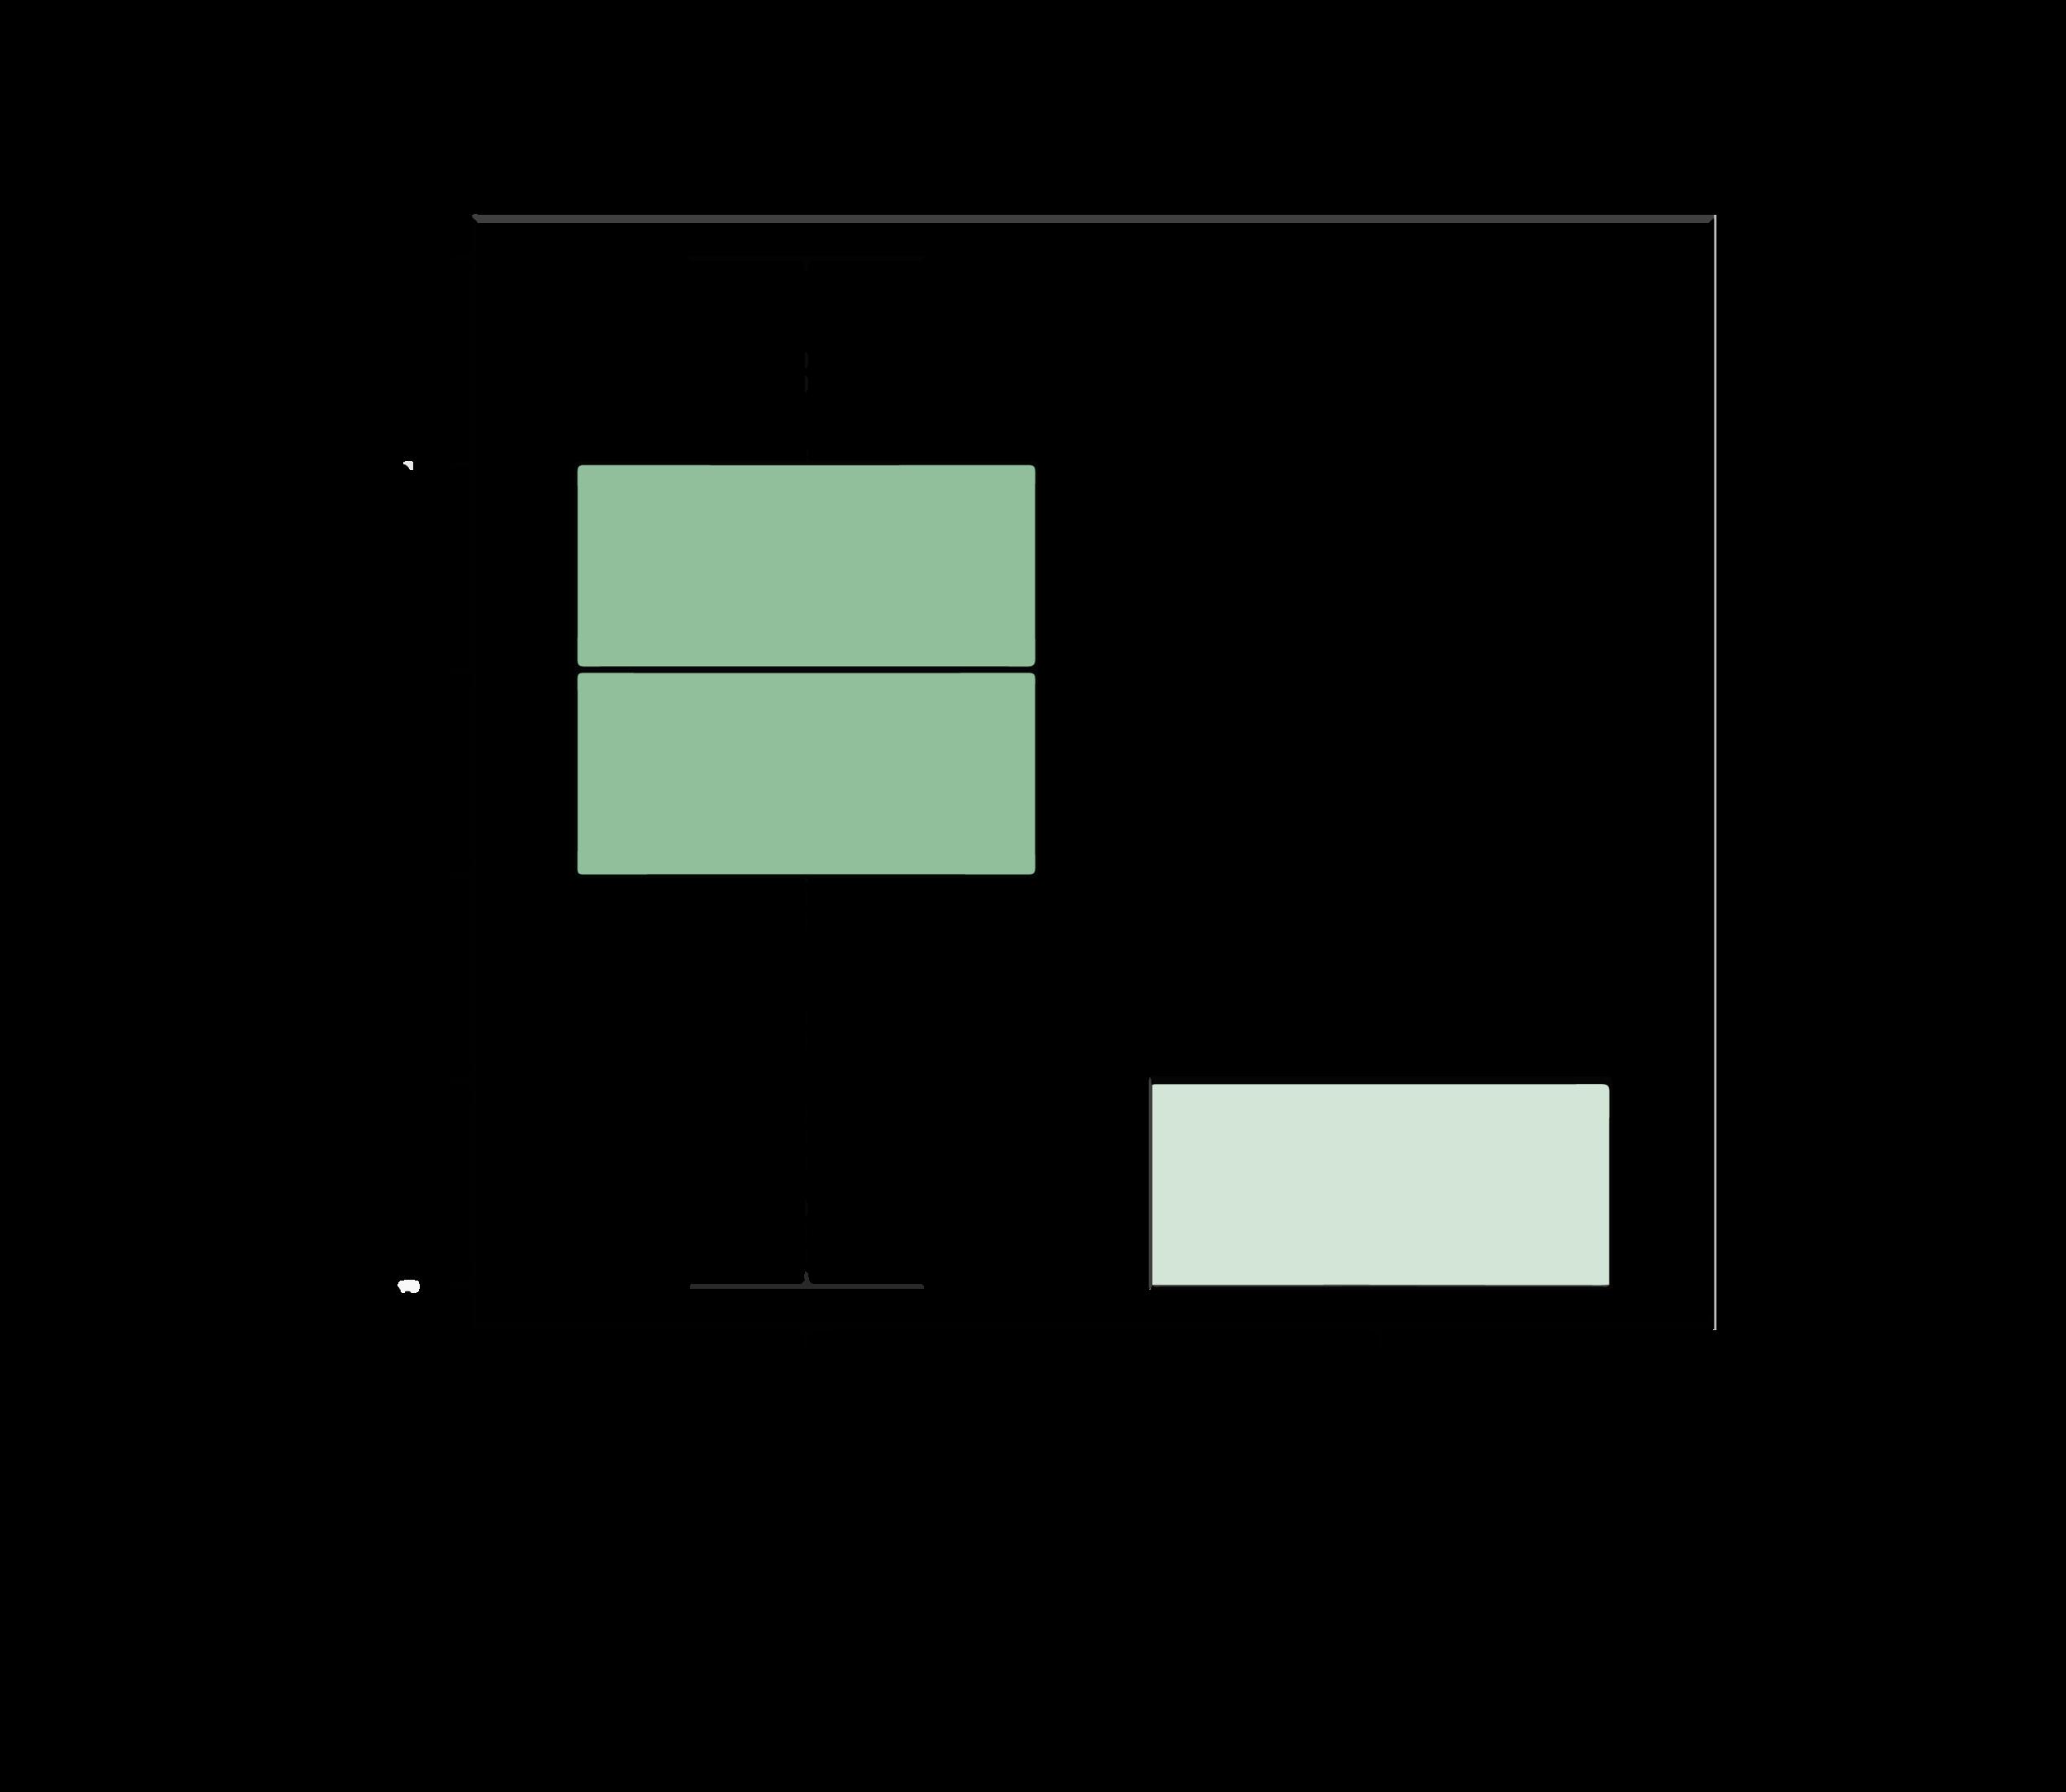 graphArtboard 3@4x.png